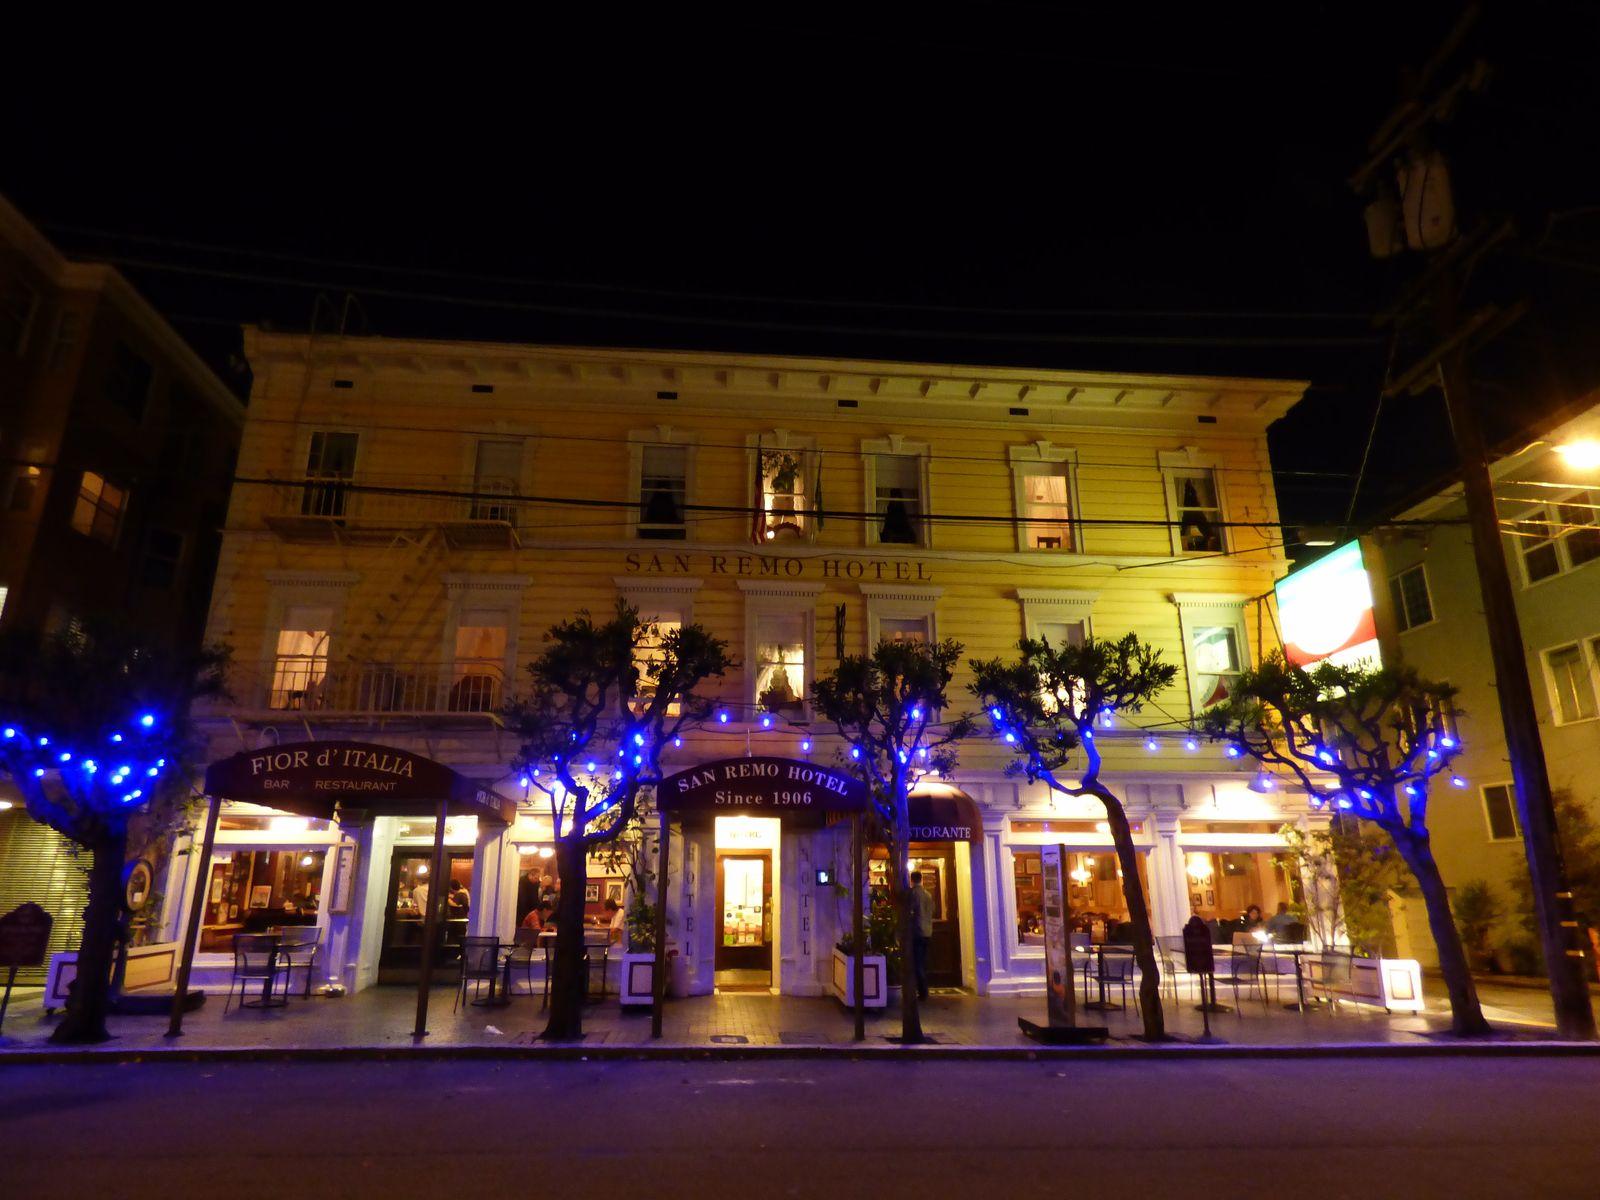 San Remo Hotel de nuit san Francisco